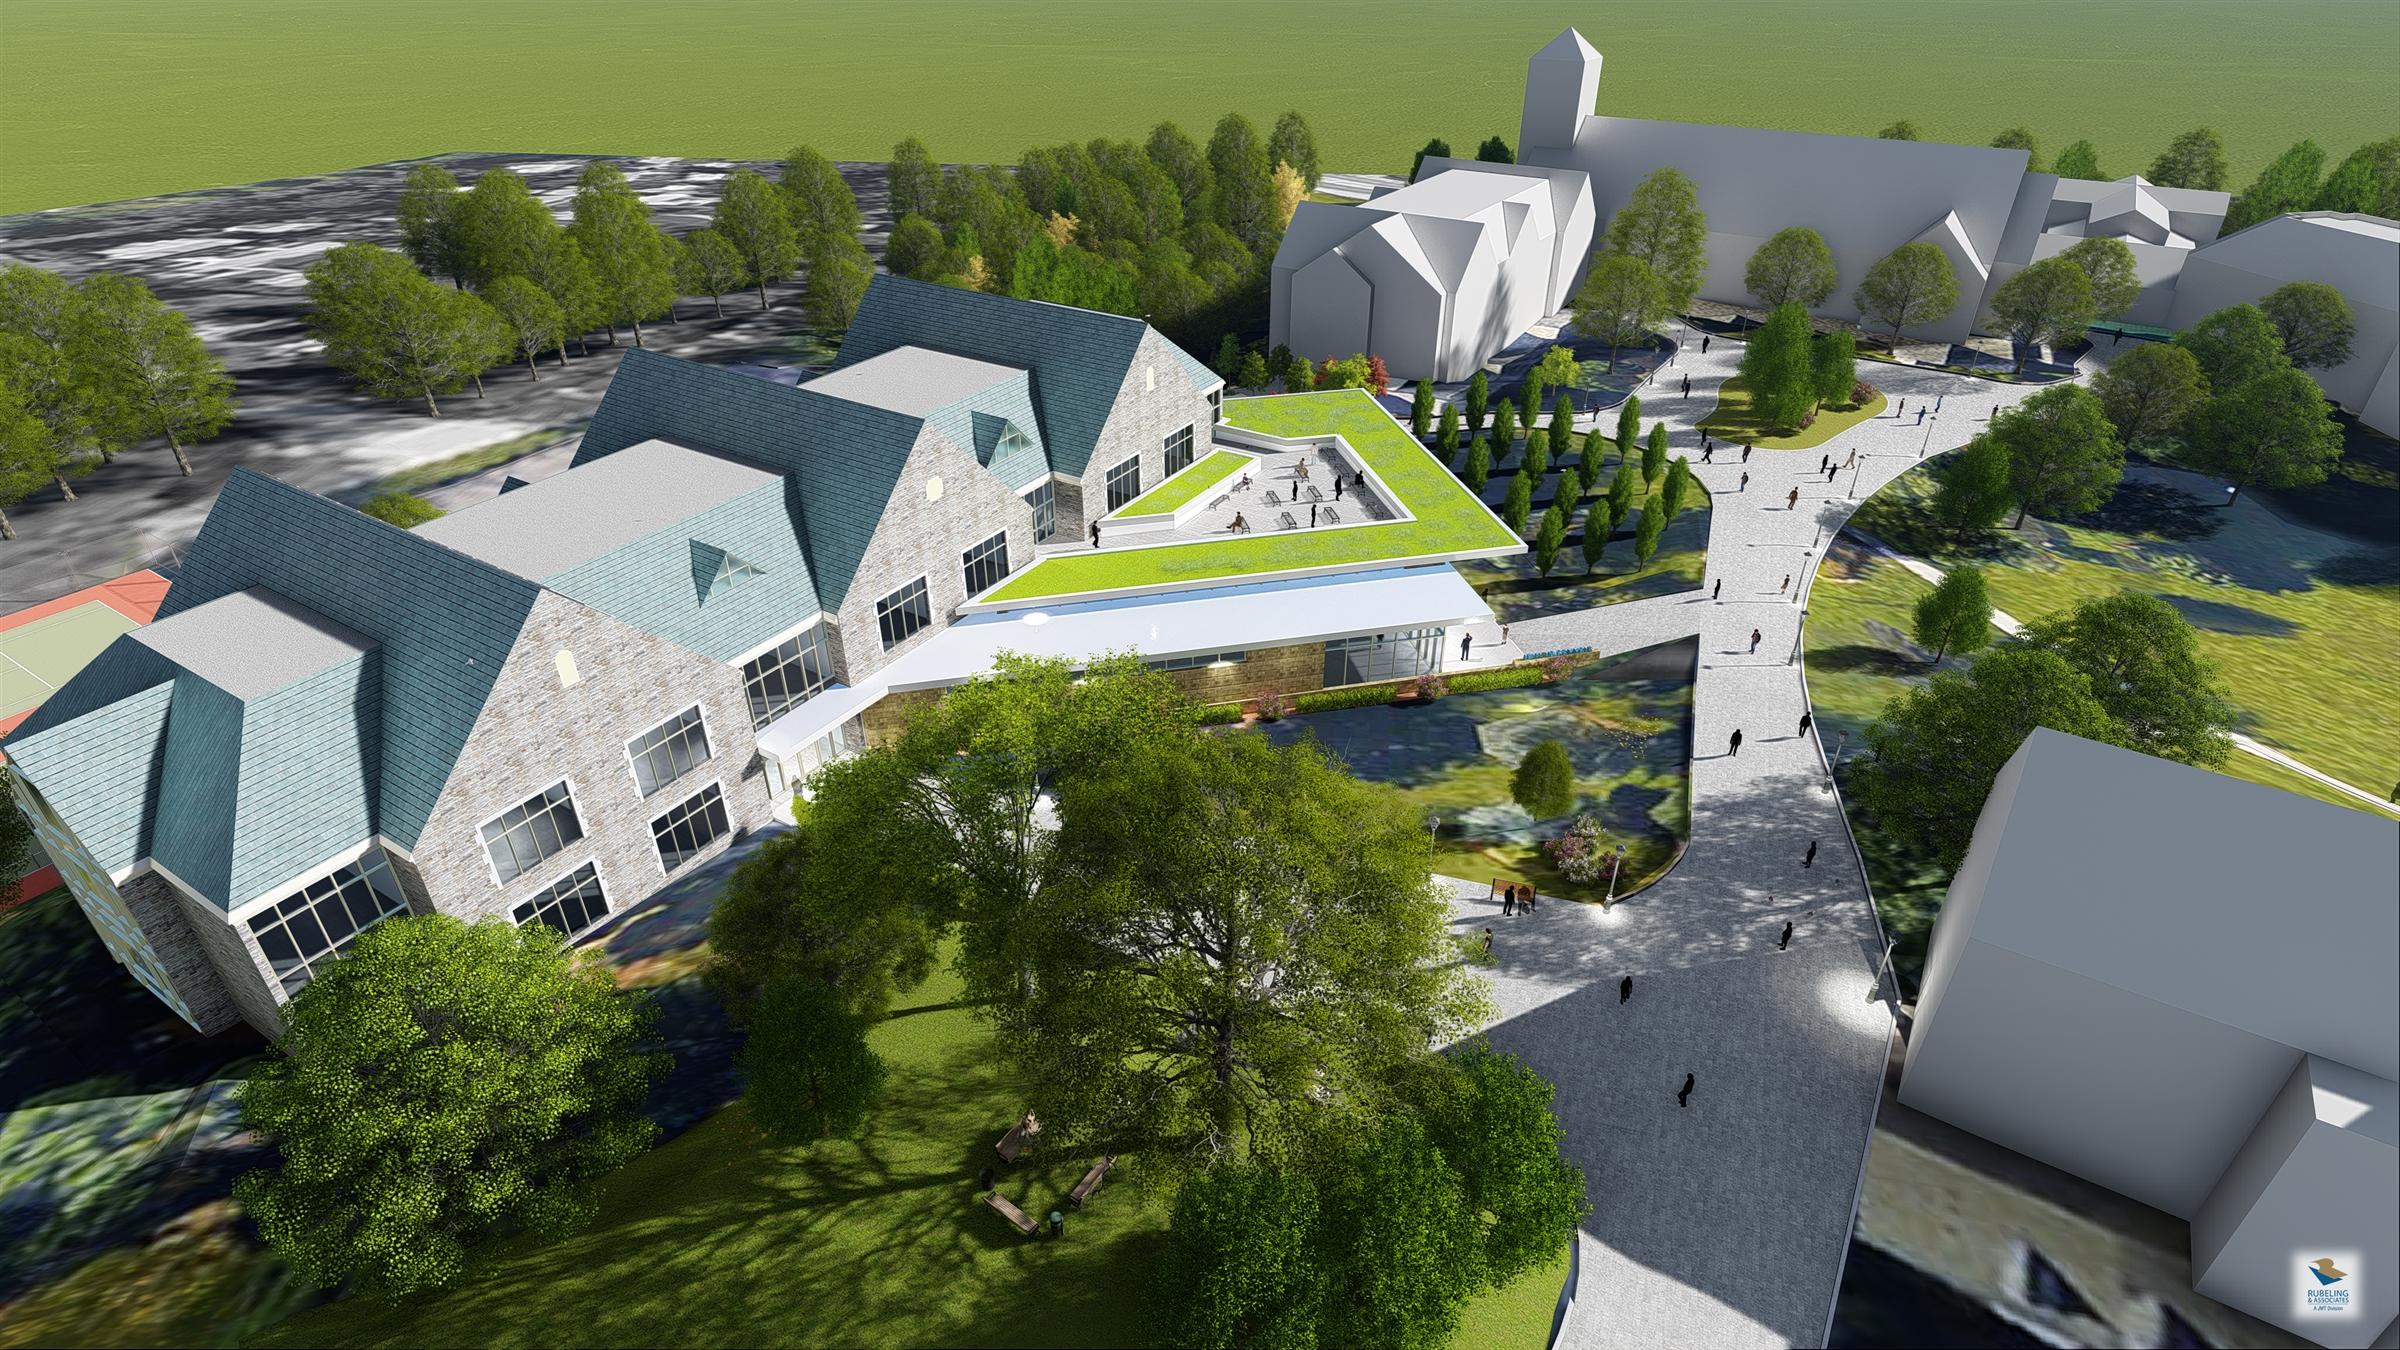 Loyola Blakefield Campus Map.Loyola Blakefield Ignite The Campaign For Loyola Blakefield